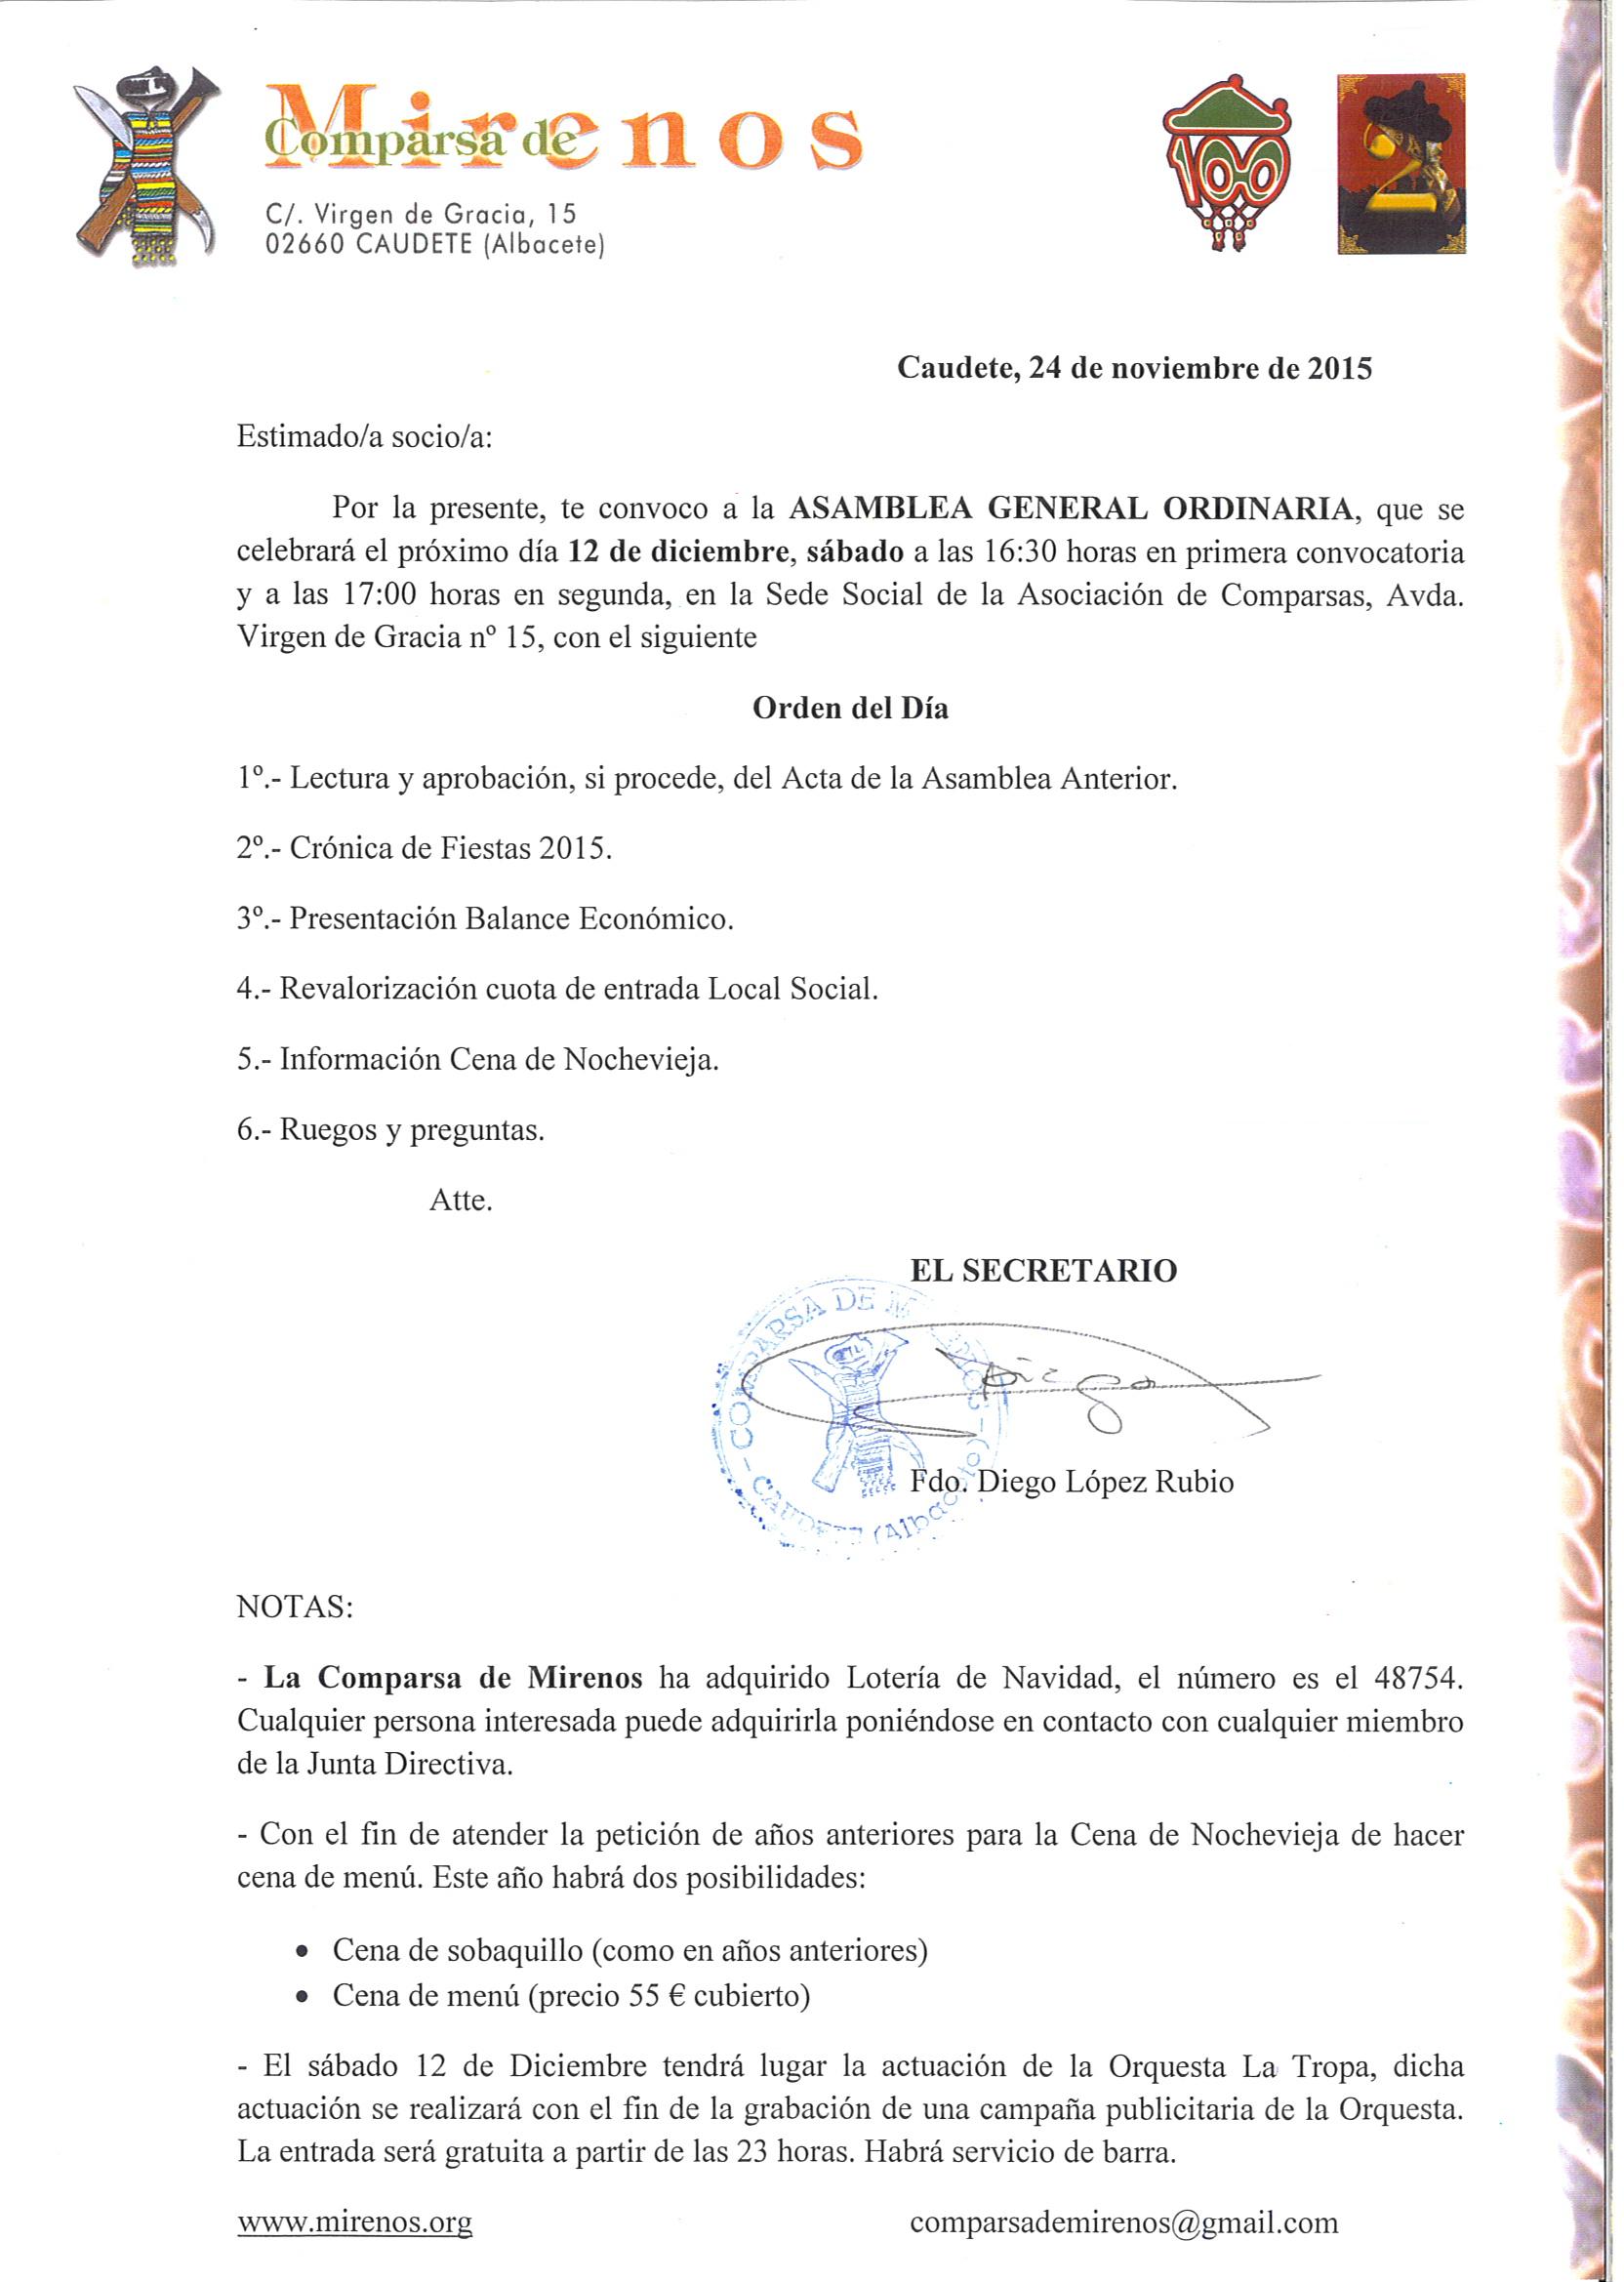 Asamblea General Ordinaria 12-12-15